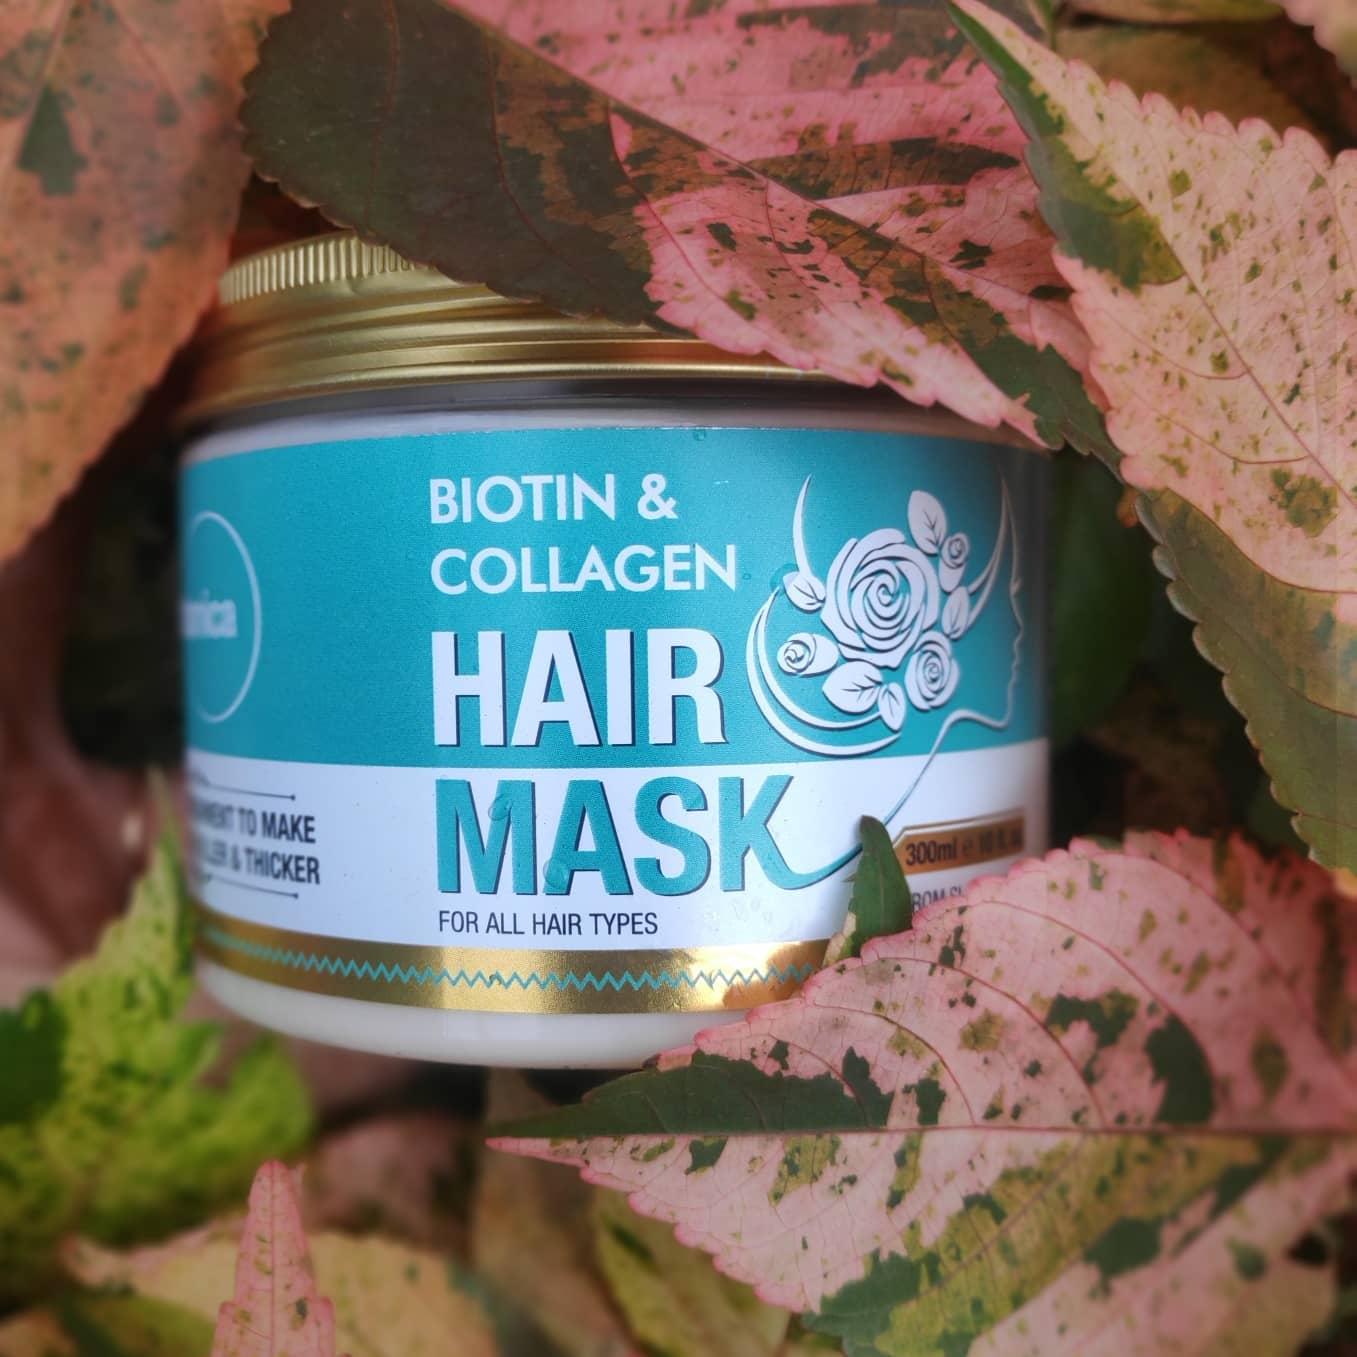 St.Botanica Biotin & Collagen Hair Mask pic 1-Strengthens hair-By Samidha_Mathur